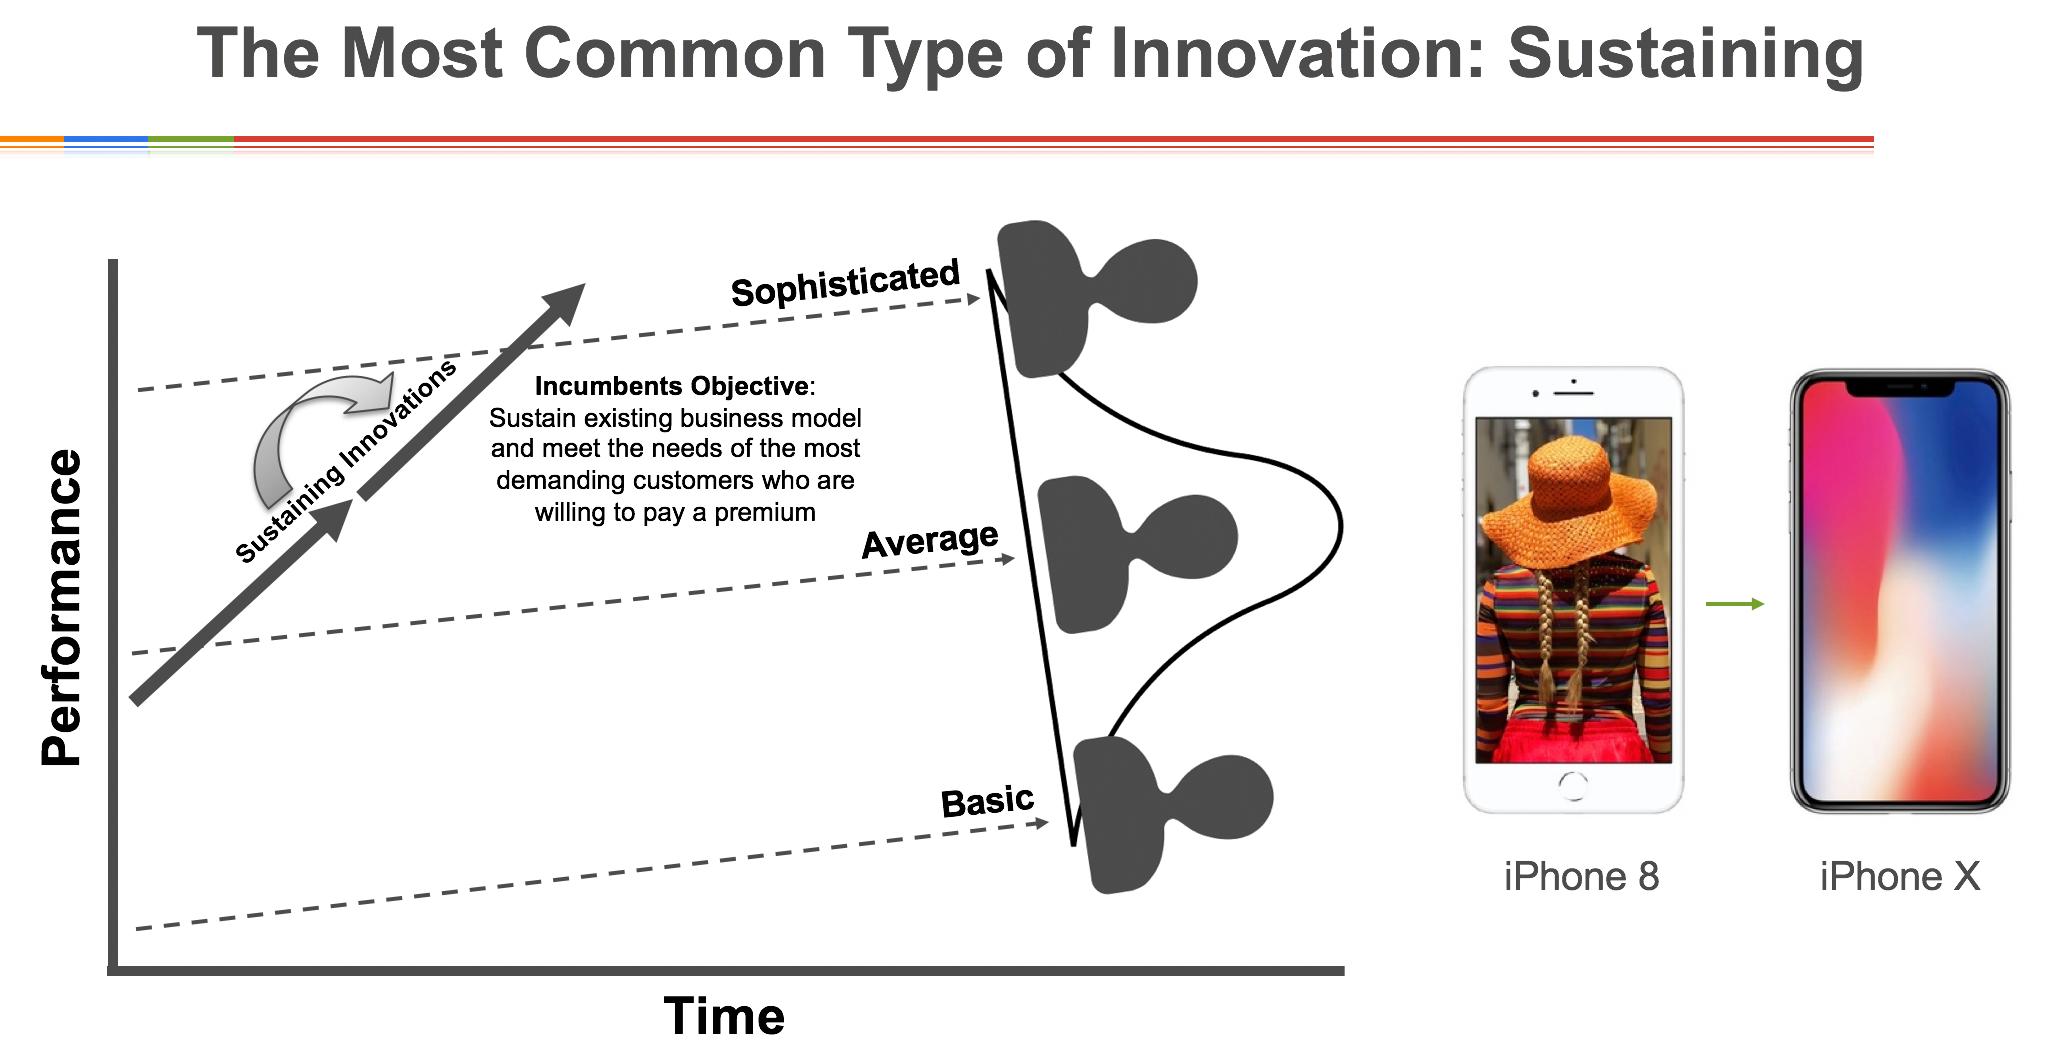 iphone x sustaining innovation